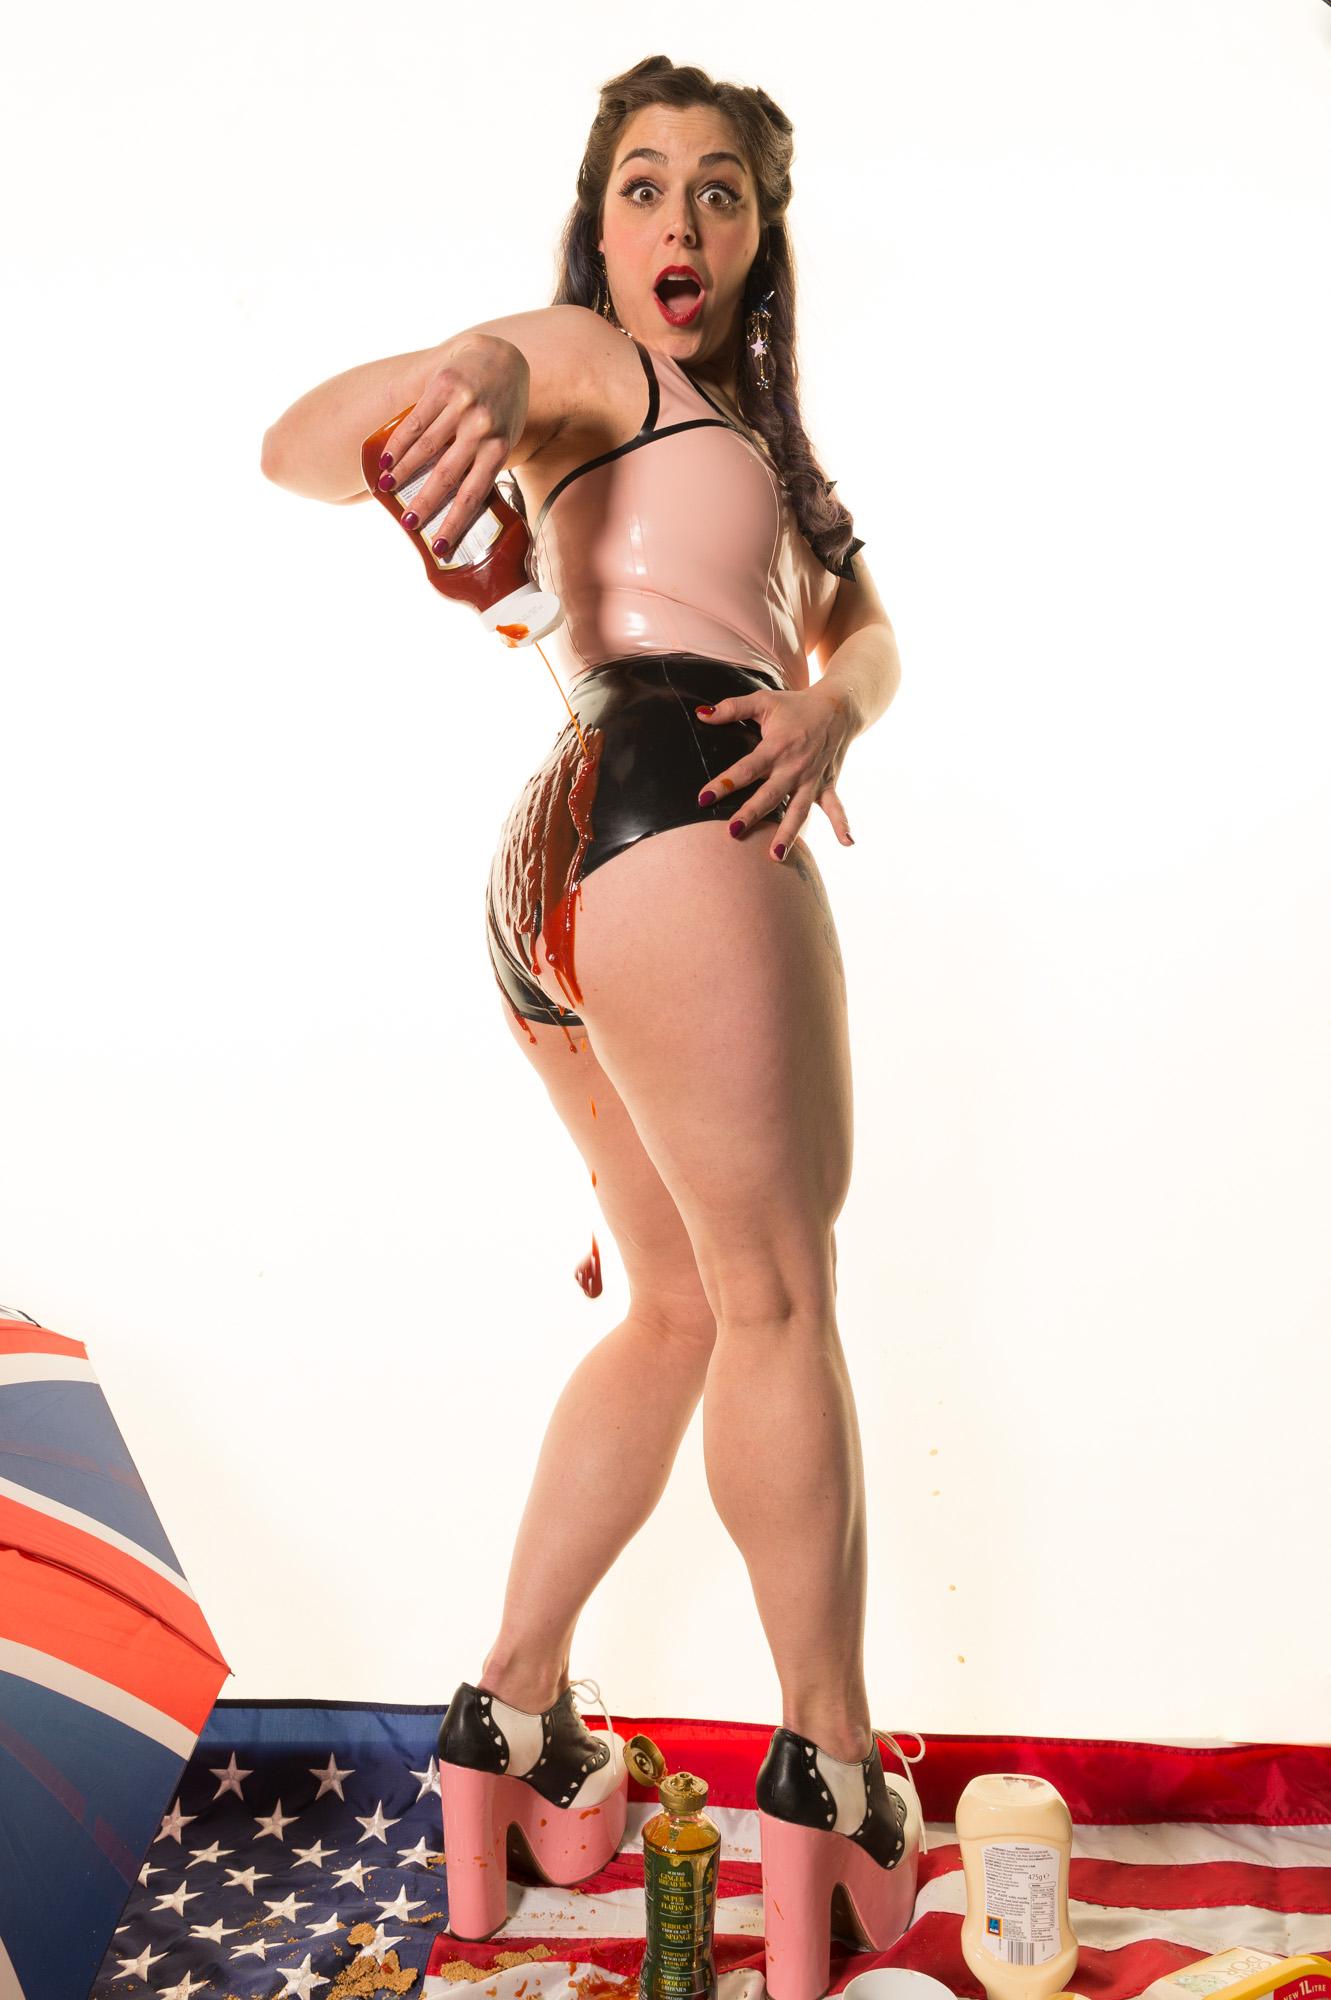 Mistress Sploshing Ketchup on Her Muscular Legs